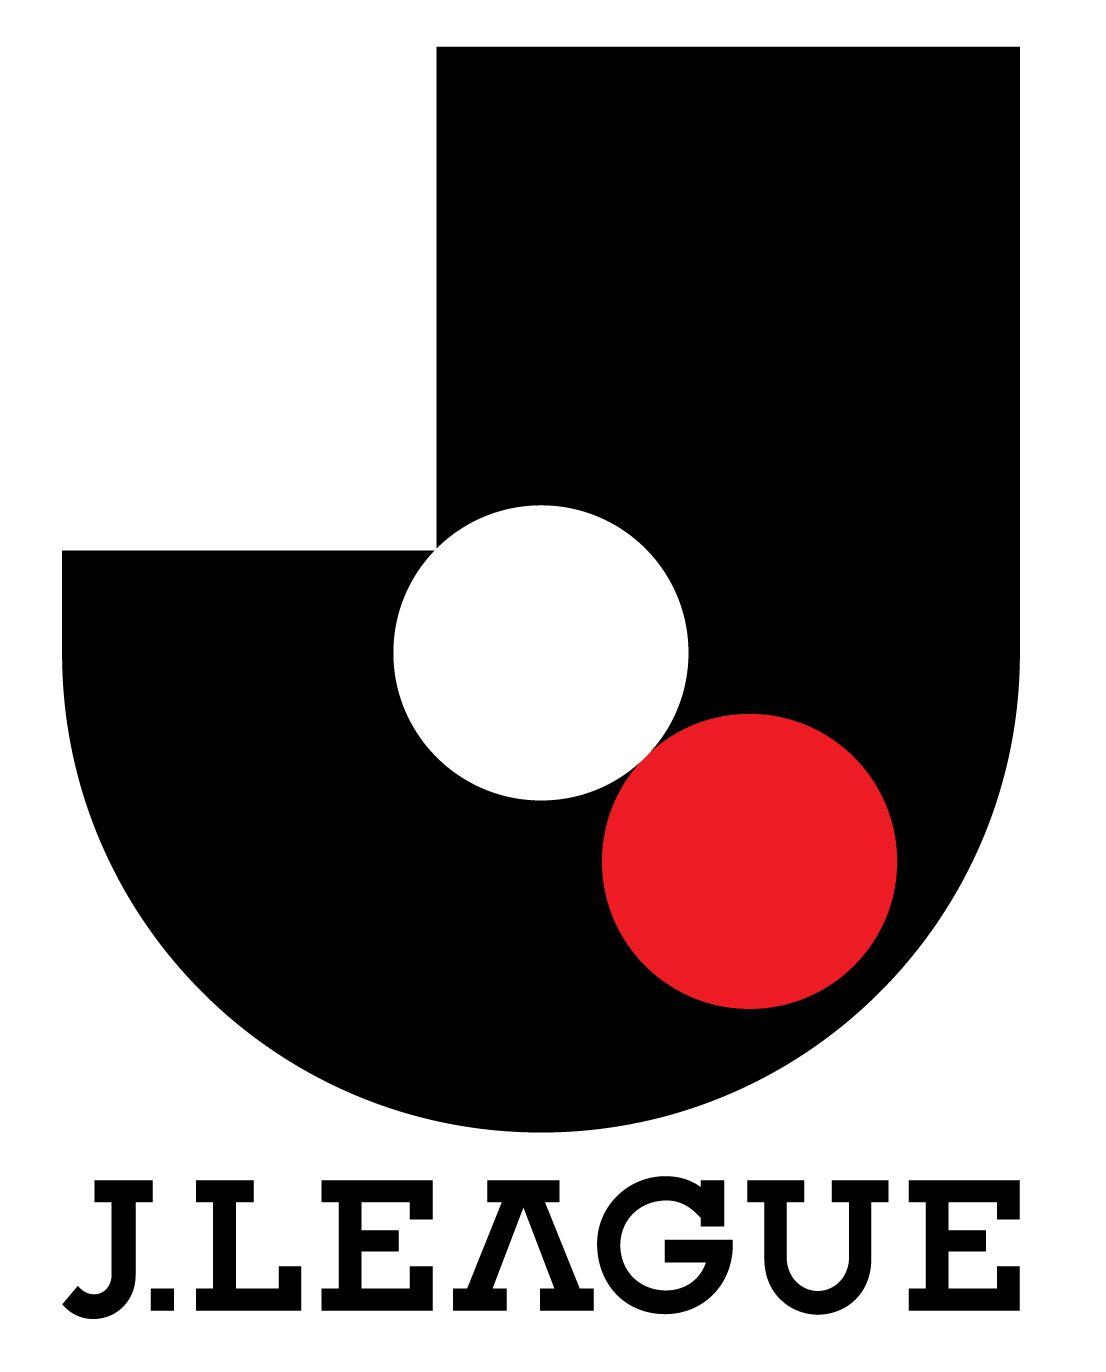 J Logo League Logo Simple Pinterest J League Football And Logos